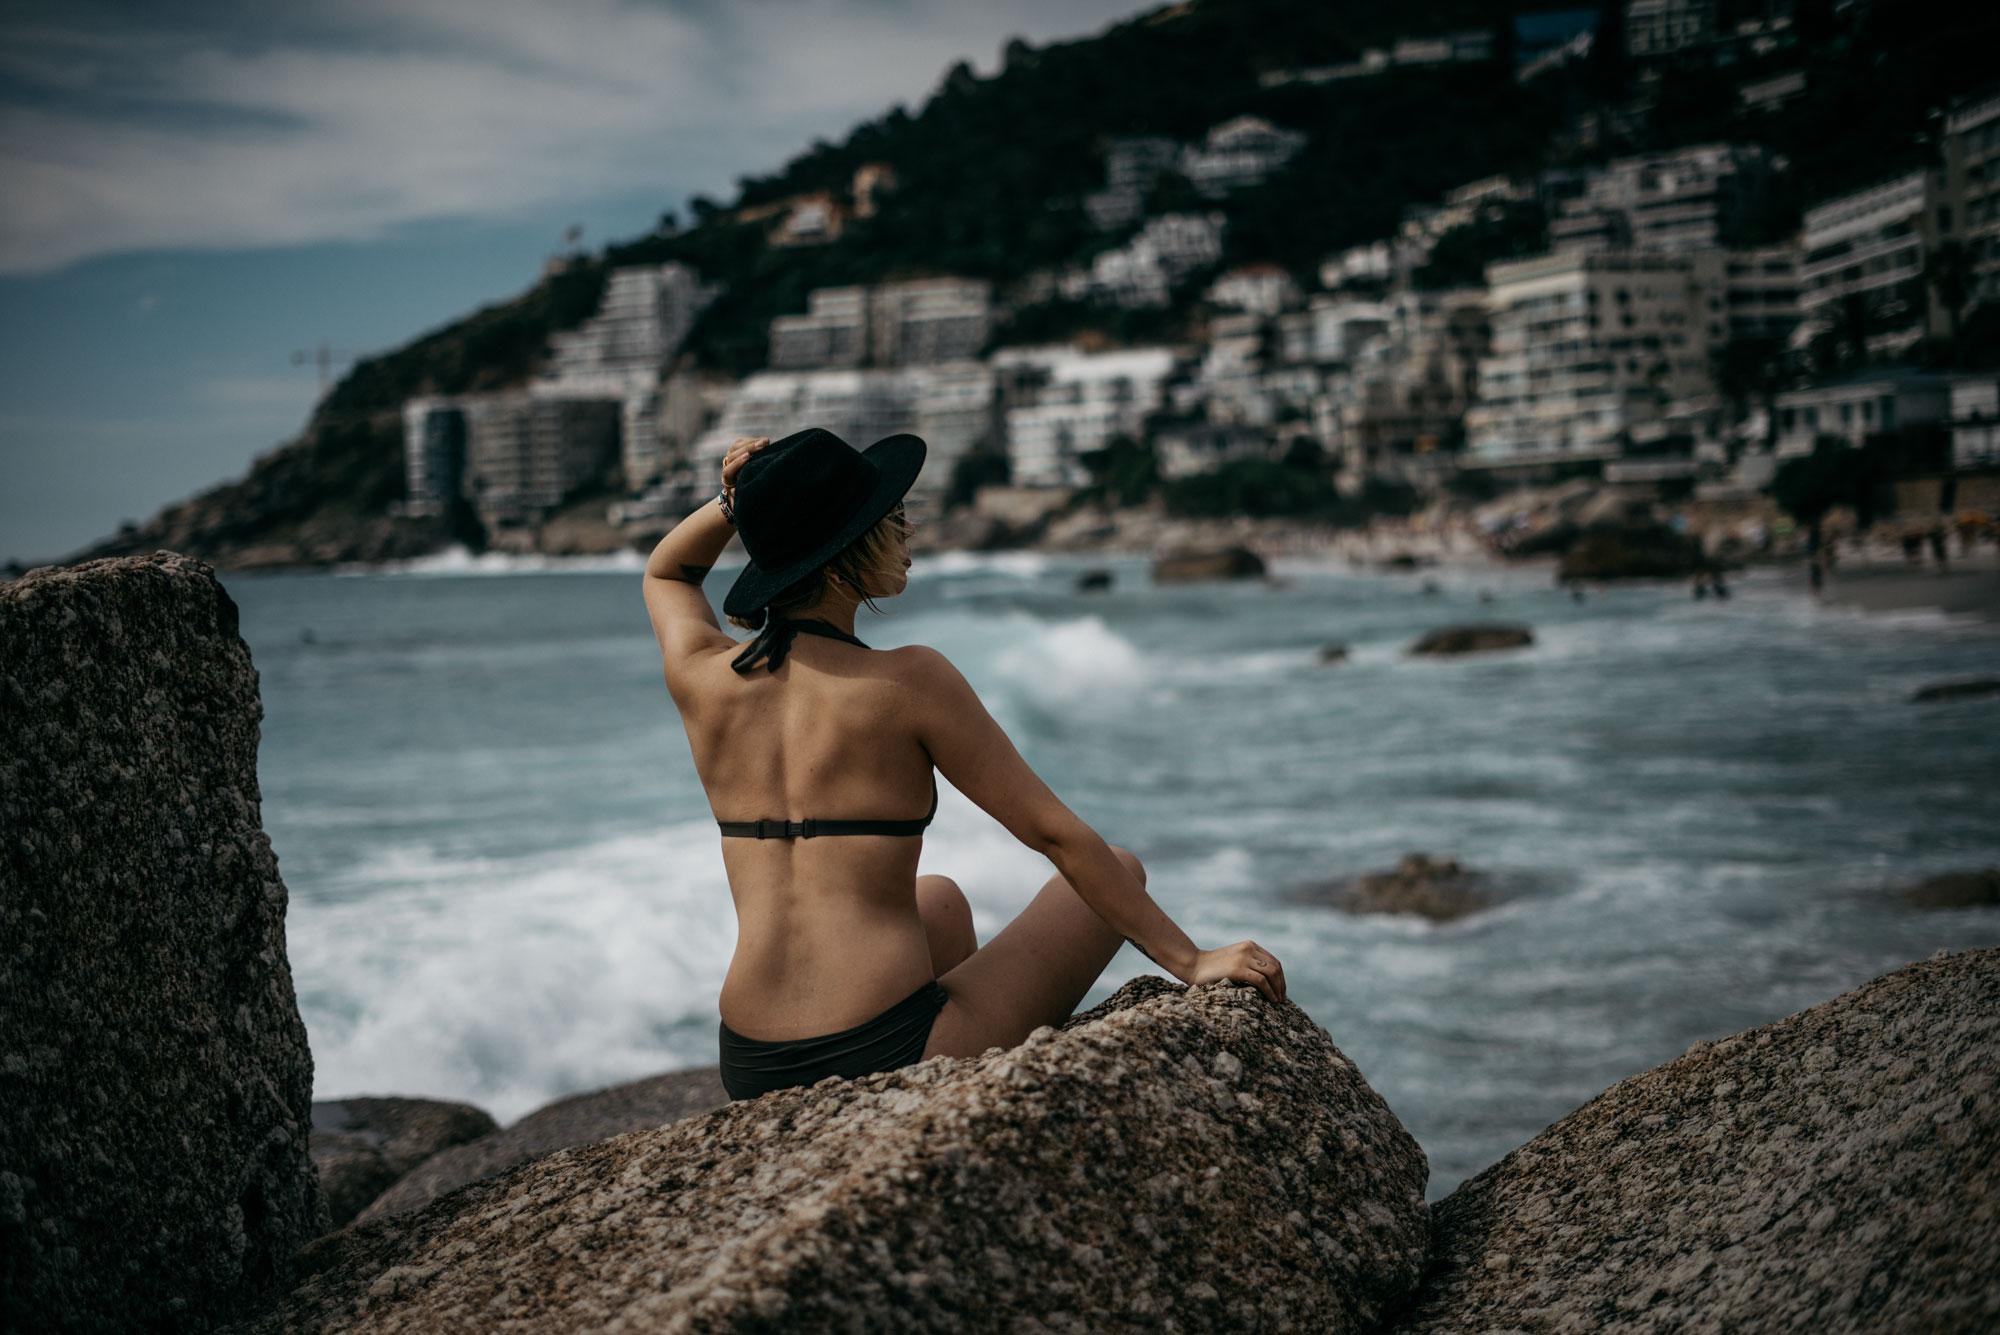 Ocean View | Beach in Cape Town, South Africa